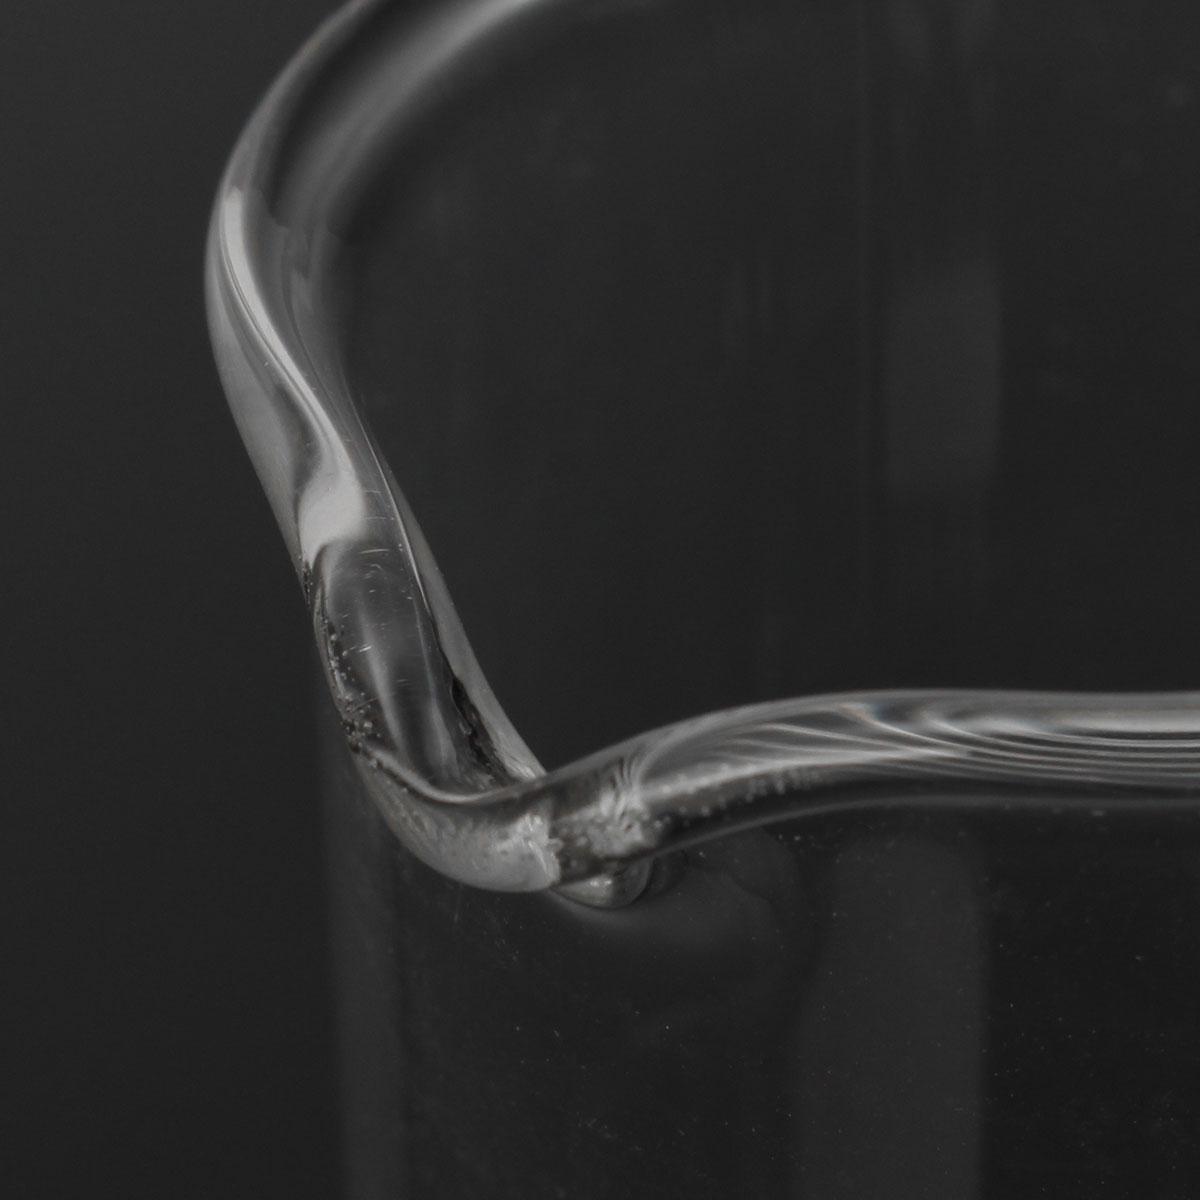 5Pcs 5ml 10ml 25ml 50ml 100ml Beaker Set Graduated Borosilicate Glass Beaker Volumetric Measuring Laboratory Glassware 36